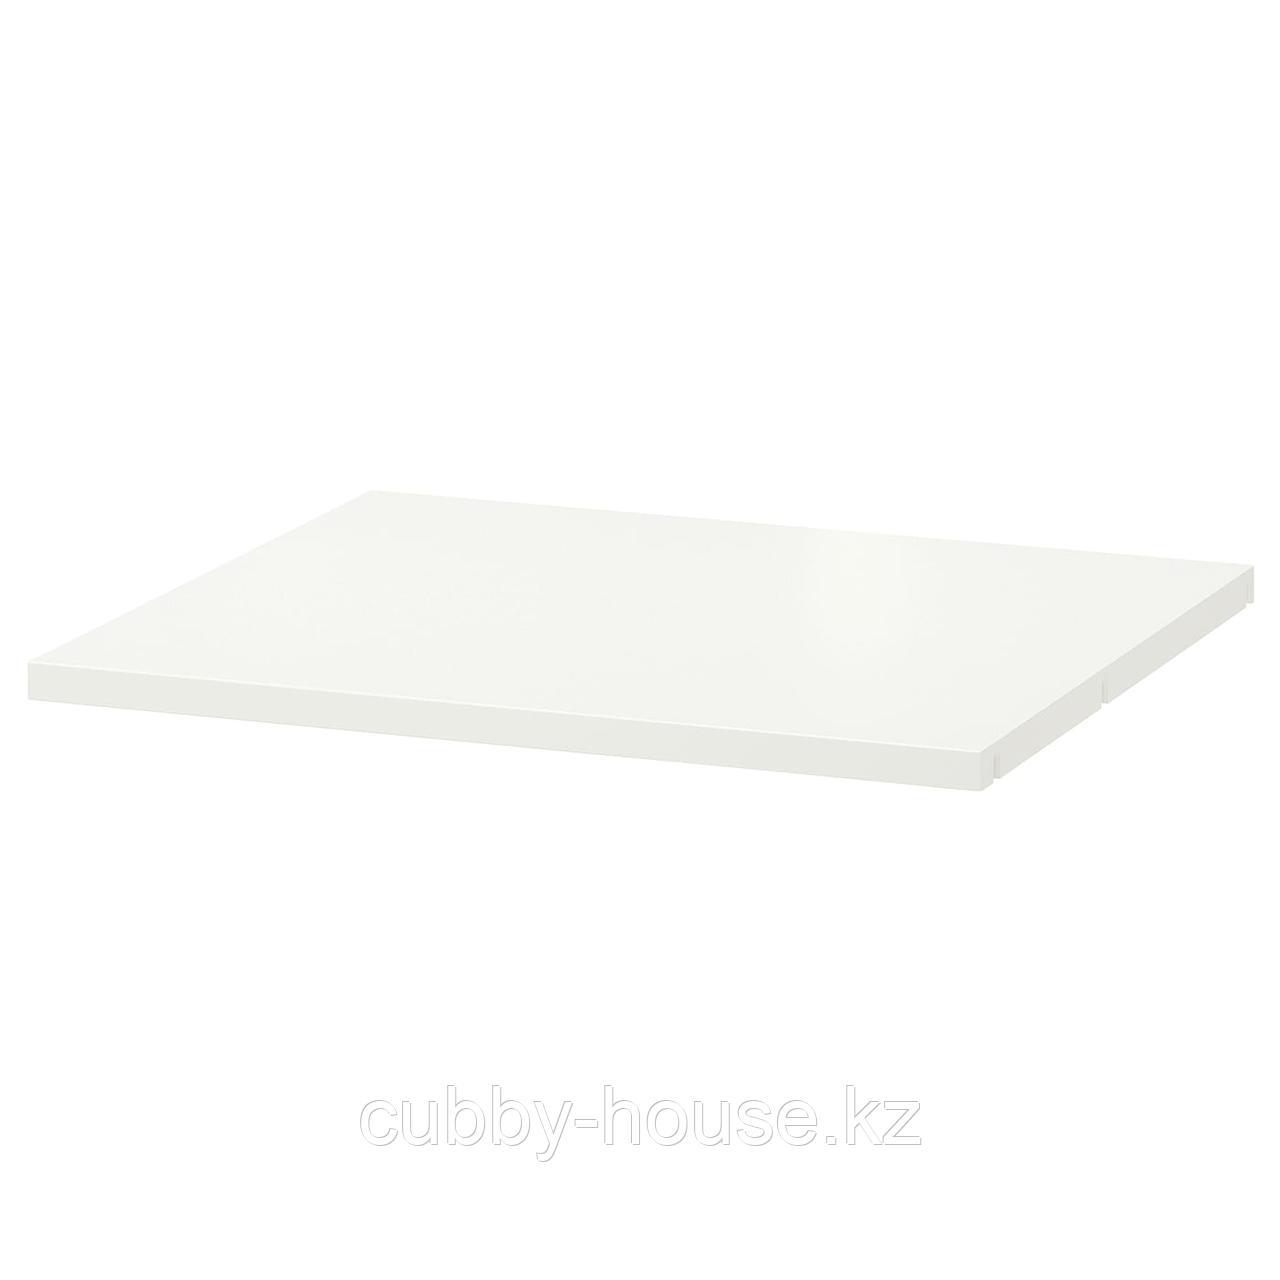 ХЭЛПА Полка, белый, 60x40 см